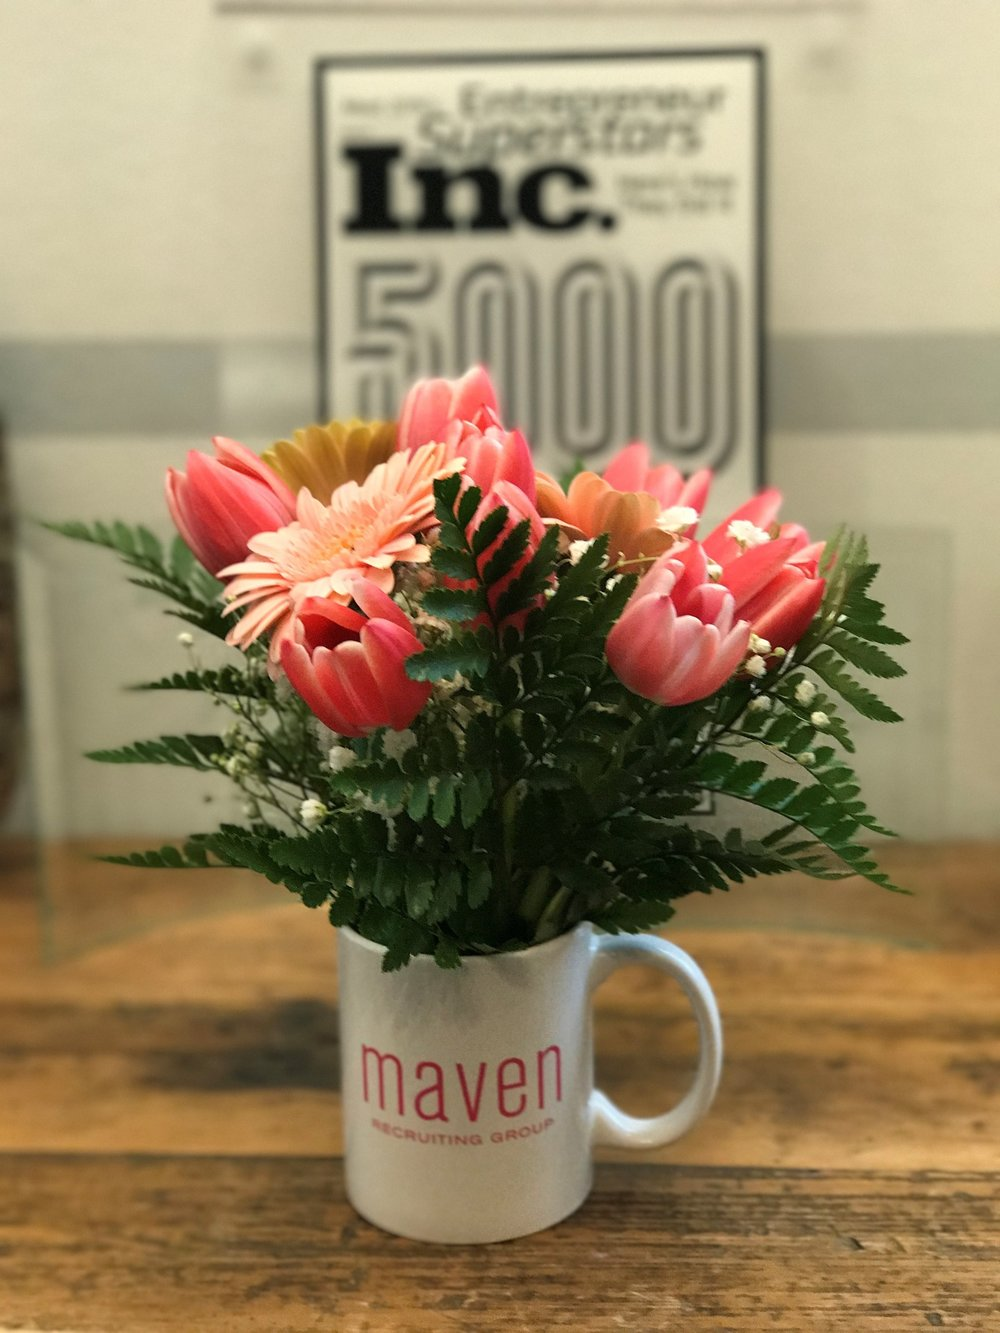 maven cup flowers.jpg